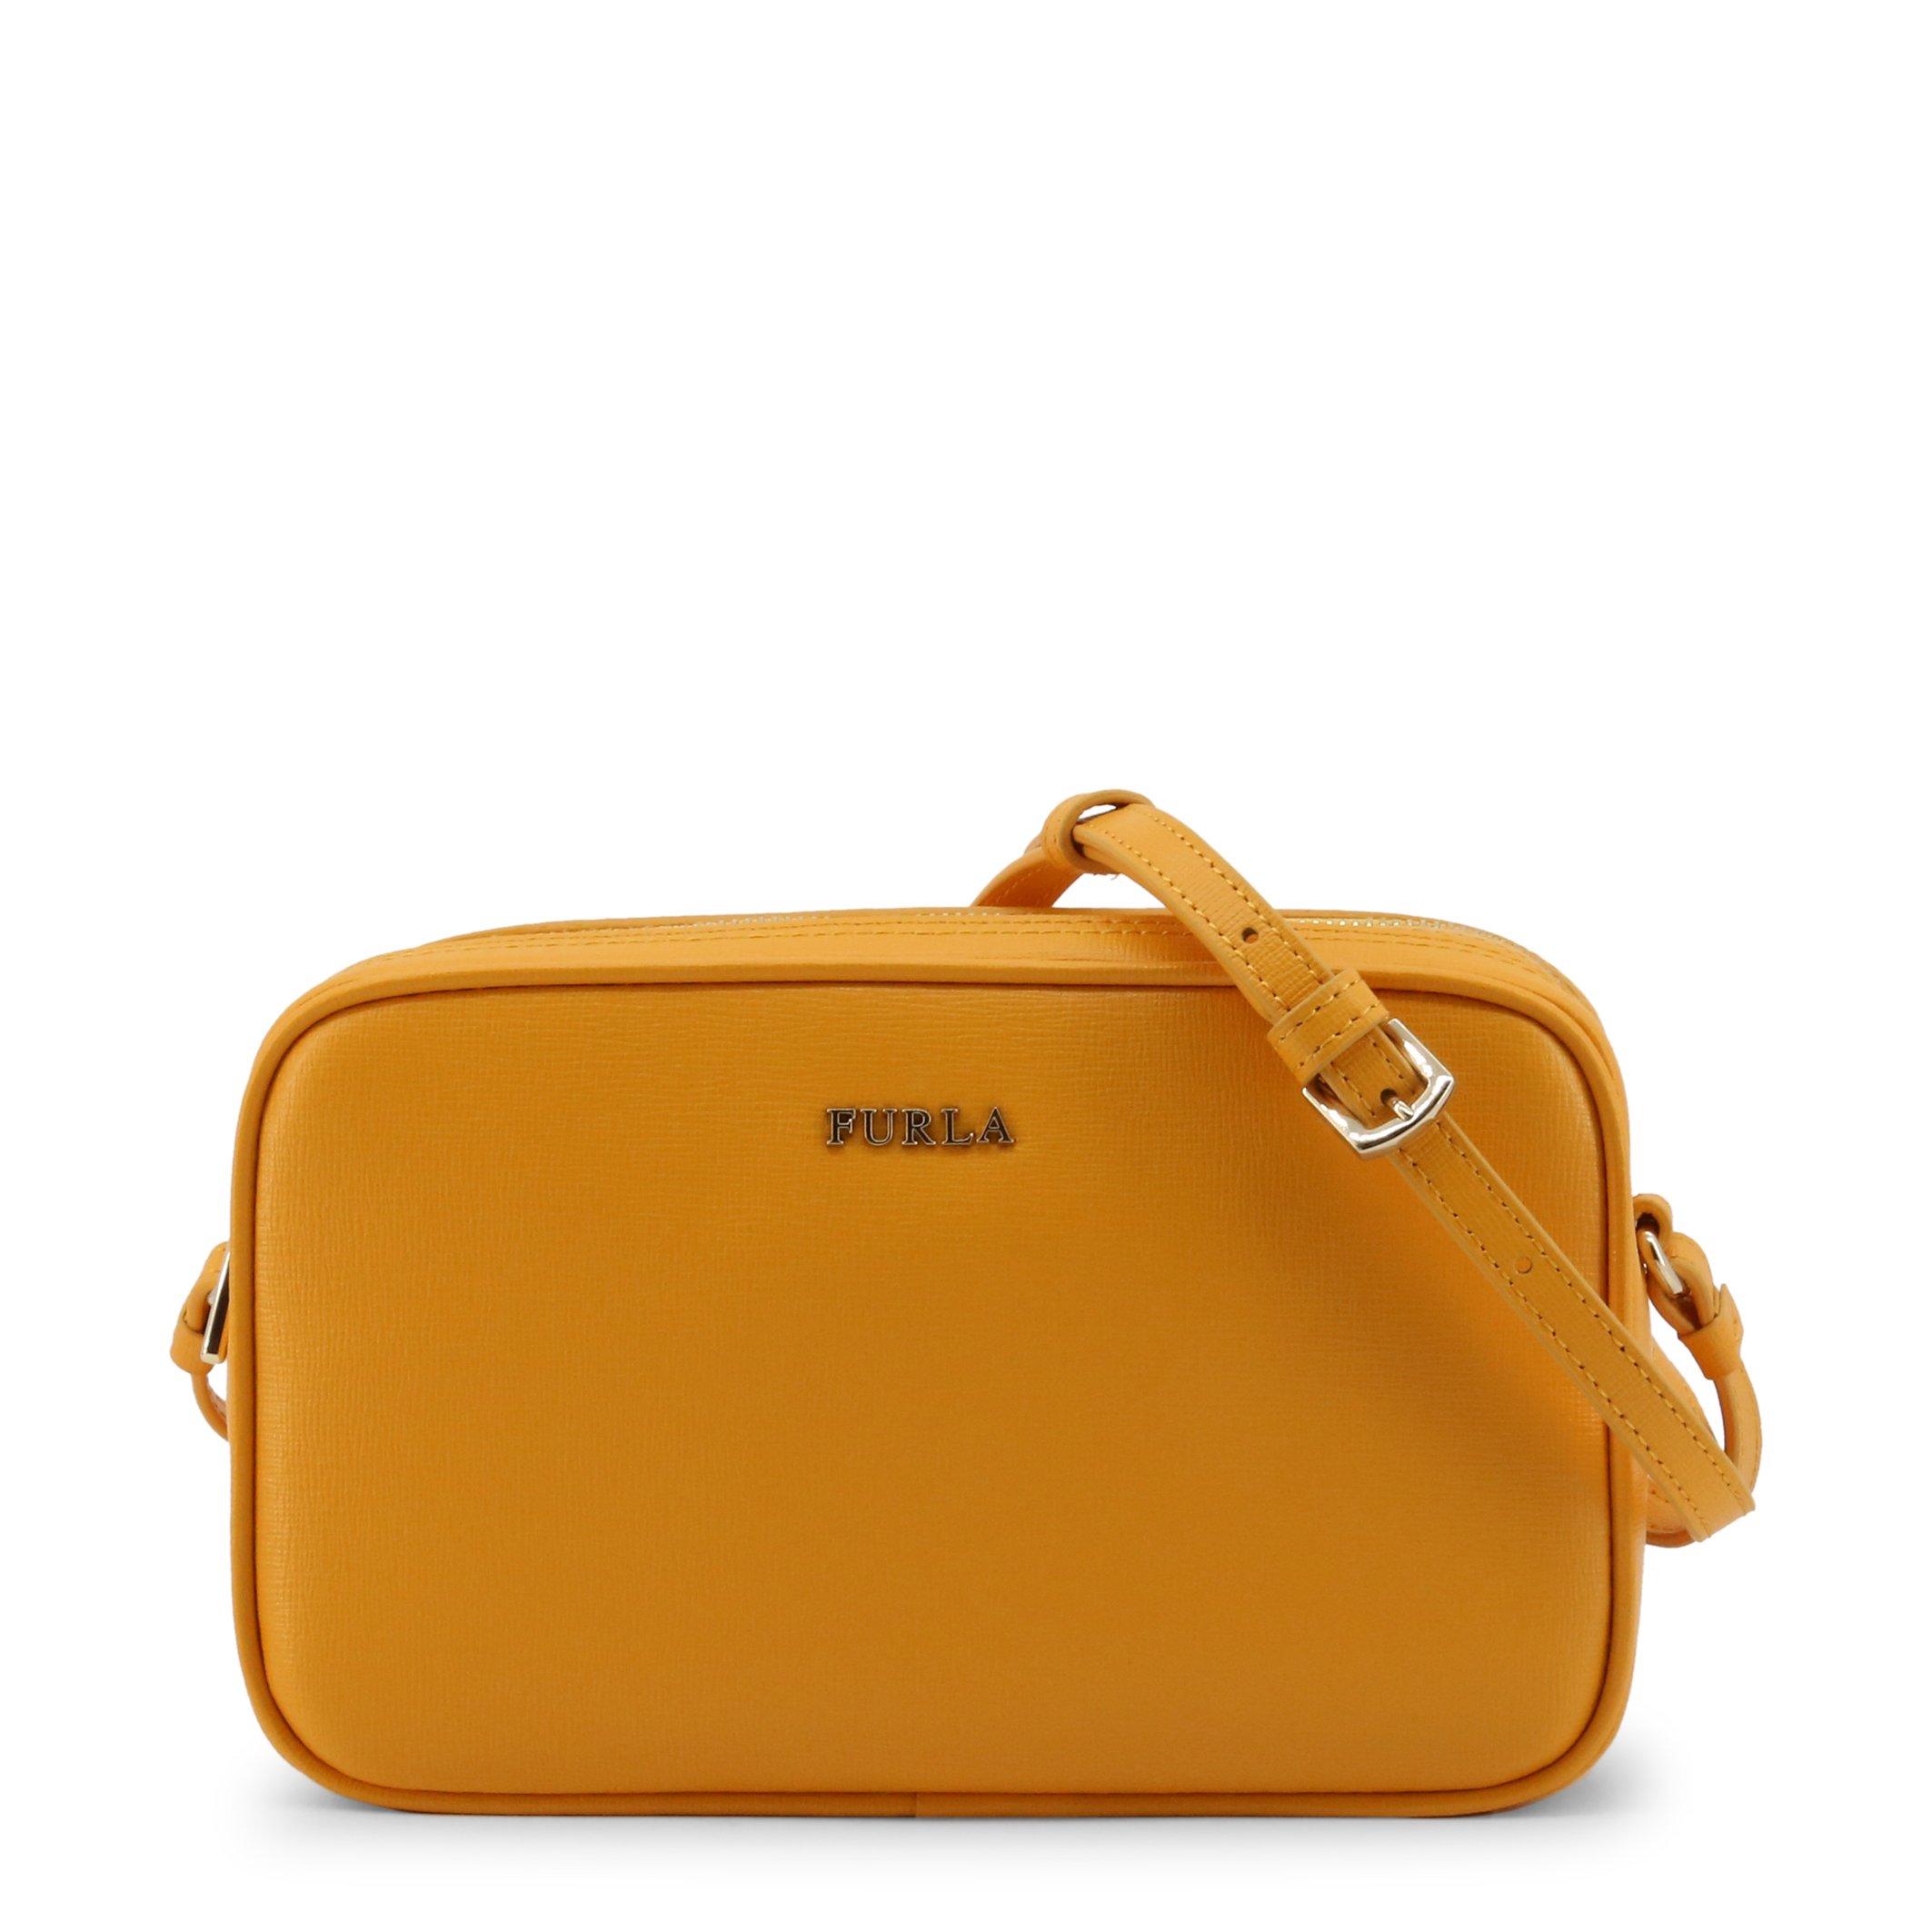 Furla Women's Crossbody Bag Various Colours LILLI_EK27LIL - orange NOSIZE